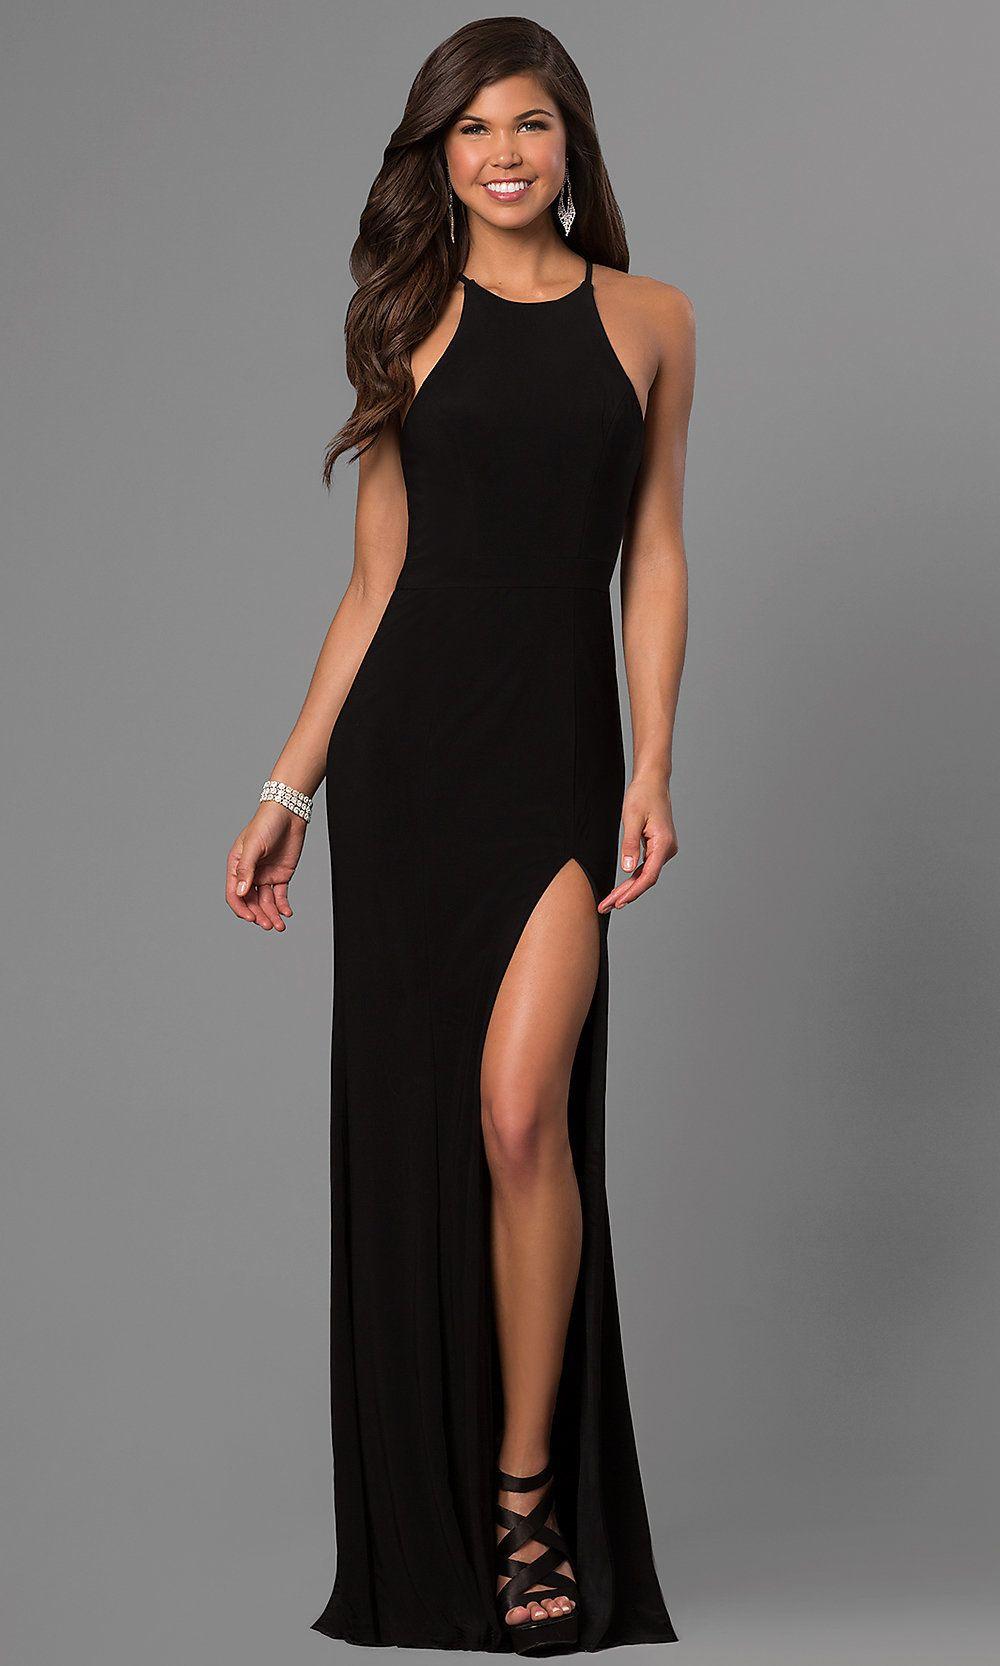 High Neck Open Back Long Black Prom Dress Prom Dresses Long Black Faviana Prom Dresses Black Prom Dress [ 1666 x 1000 Pixel ]